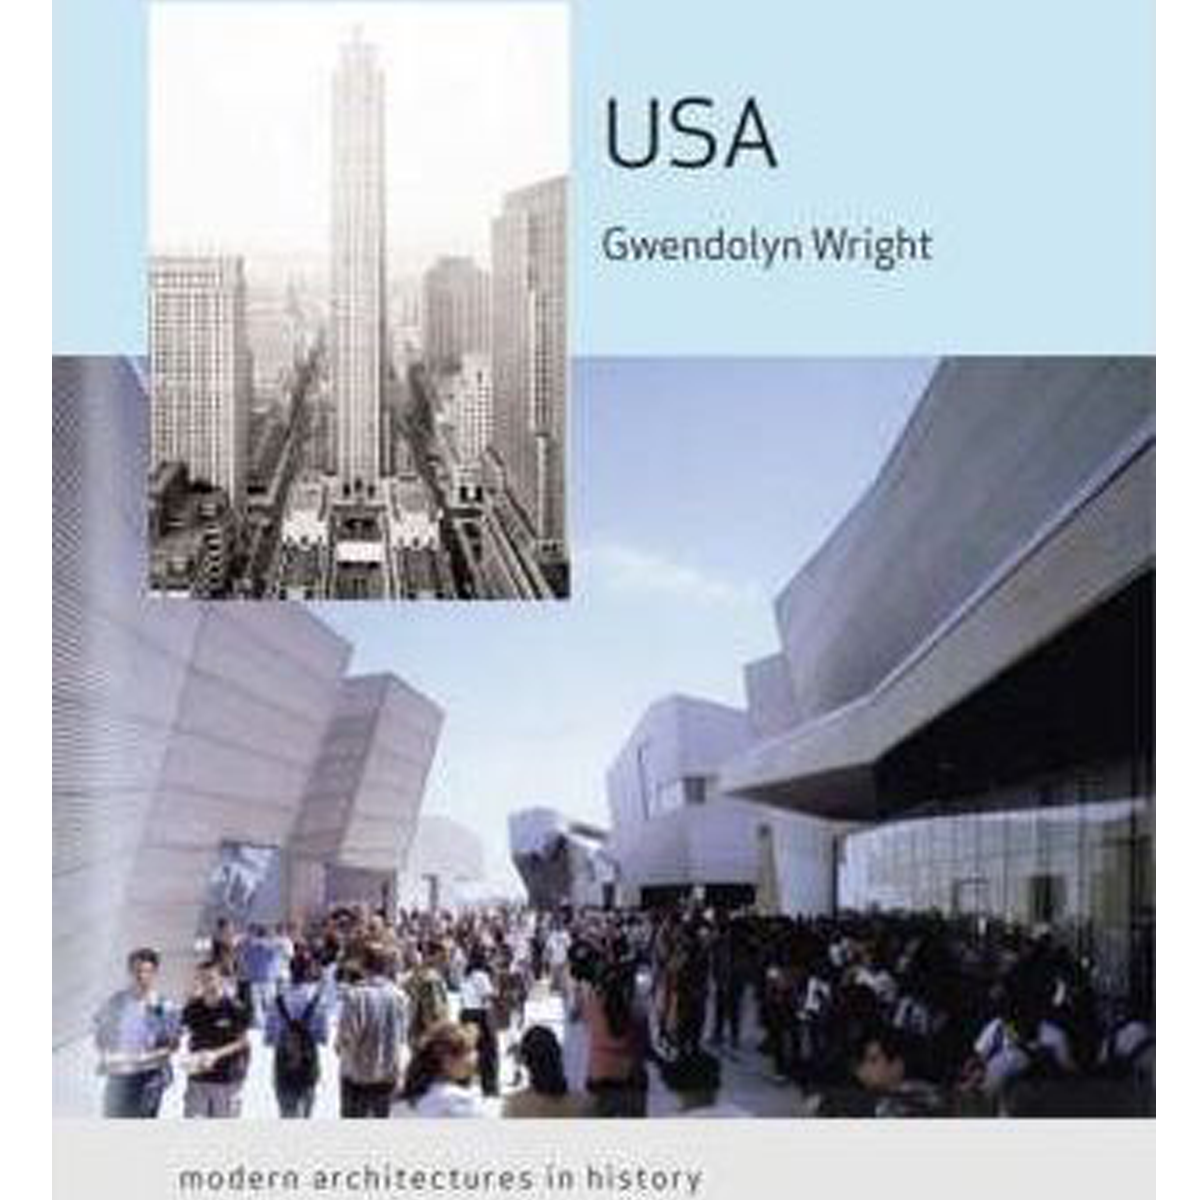 USA: Modern Architectures